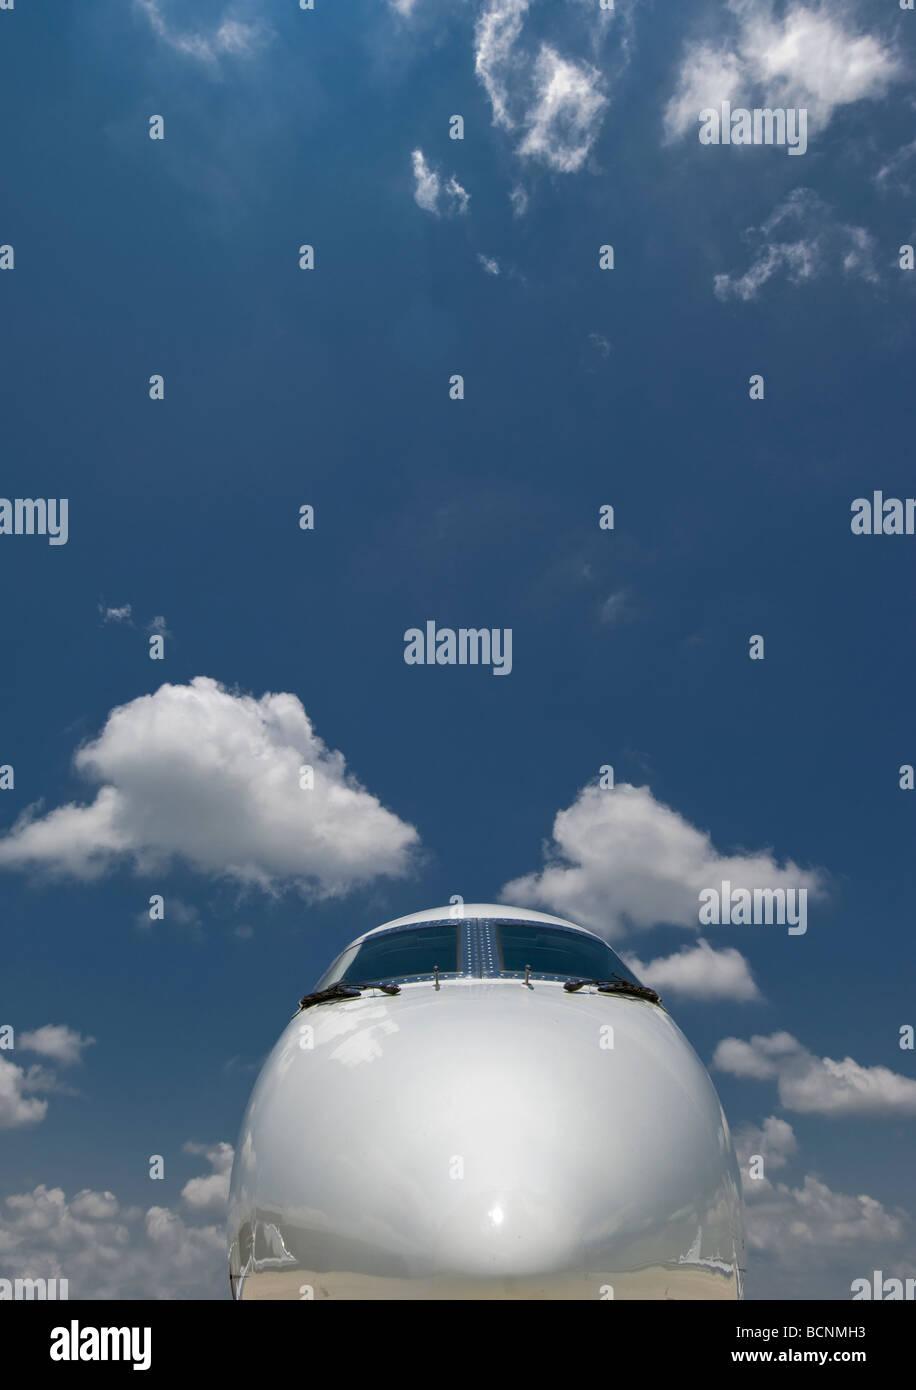 Nose of Jet Aircraft - Stock Image